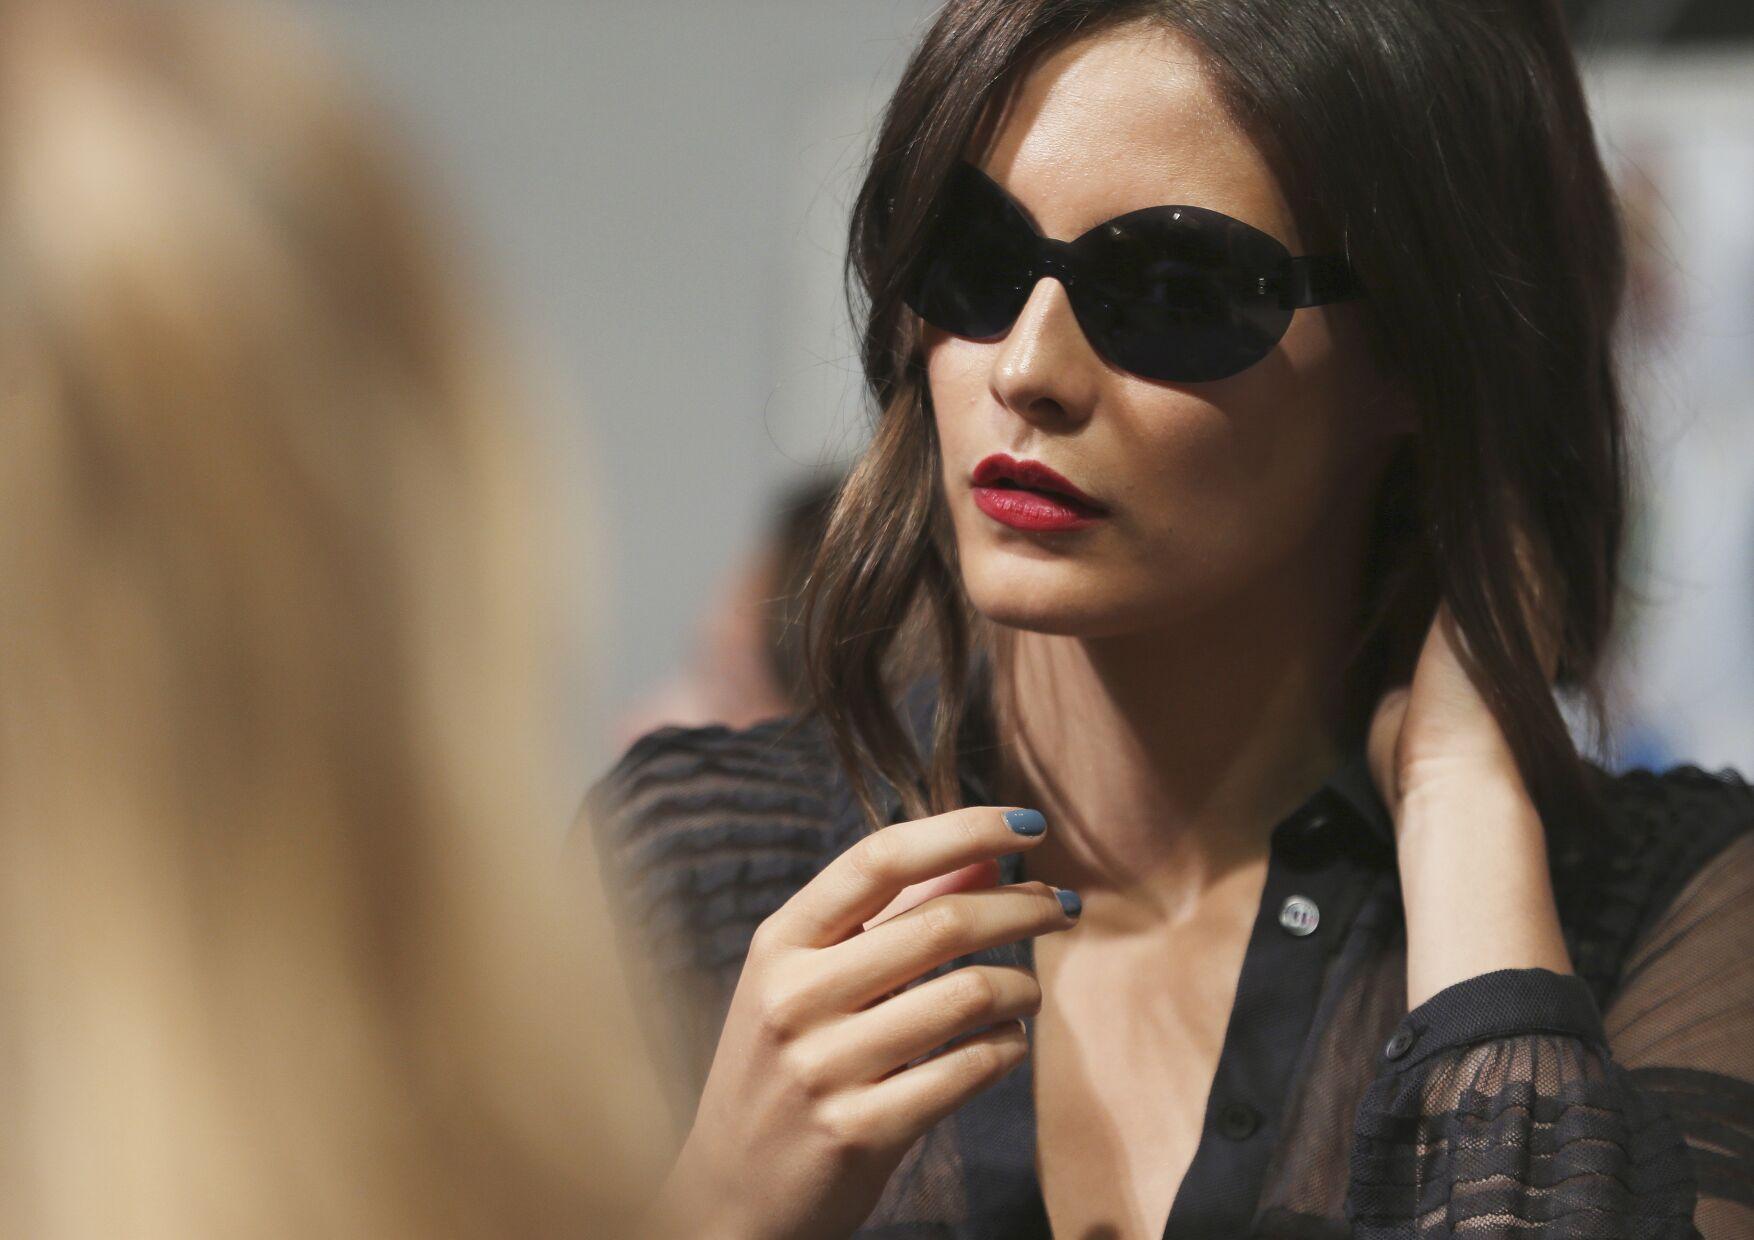 Model Backstage Burberry Prorsum Fashion Show